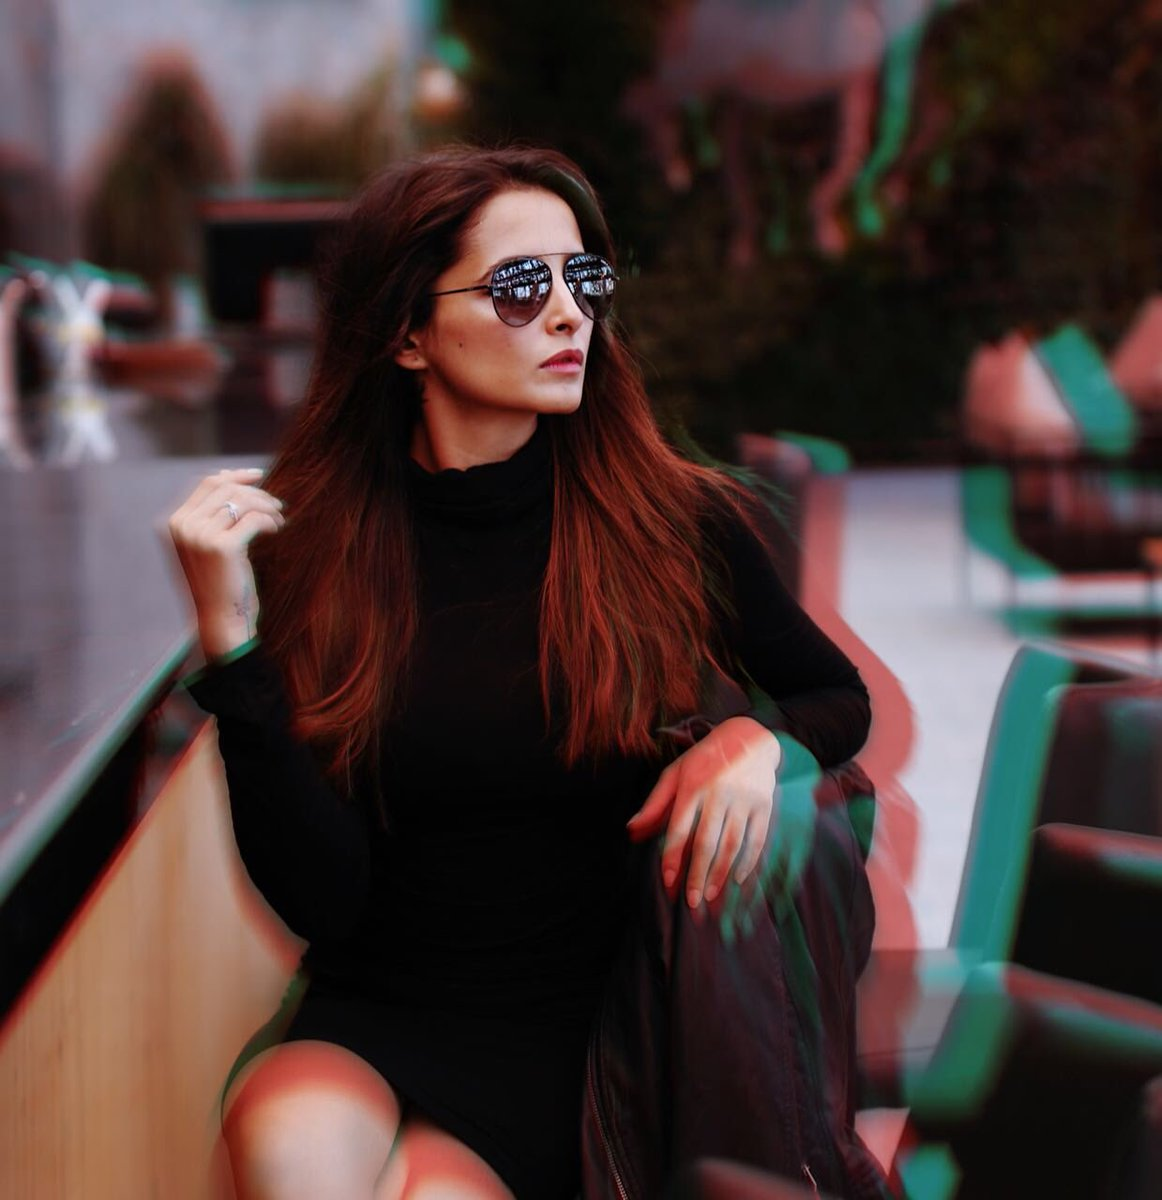 Summer or winter black aviators never go out of style! As seen on @ShethJinita #IDEE #IDEEfamewear #IDEEeyewear #Famewear<br>http://pic.twitter.com/HIIdalIP5d